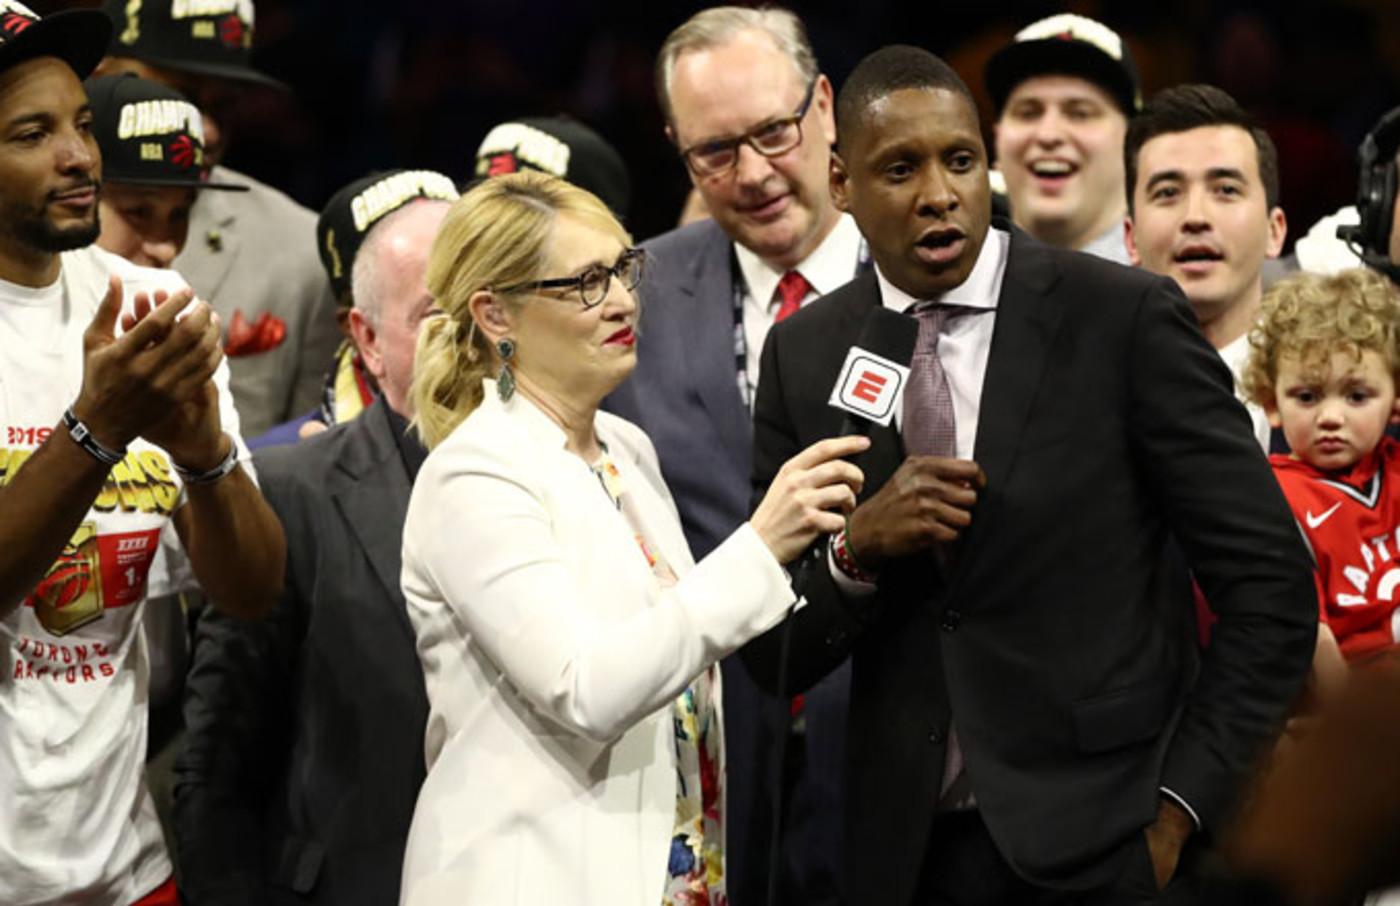 Raptors exec. Masai Ujiri talks to ESPN's Doris Burke after the team wins the 2019 championship.